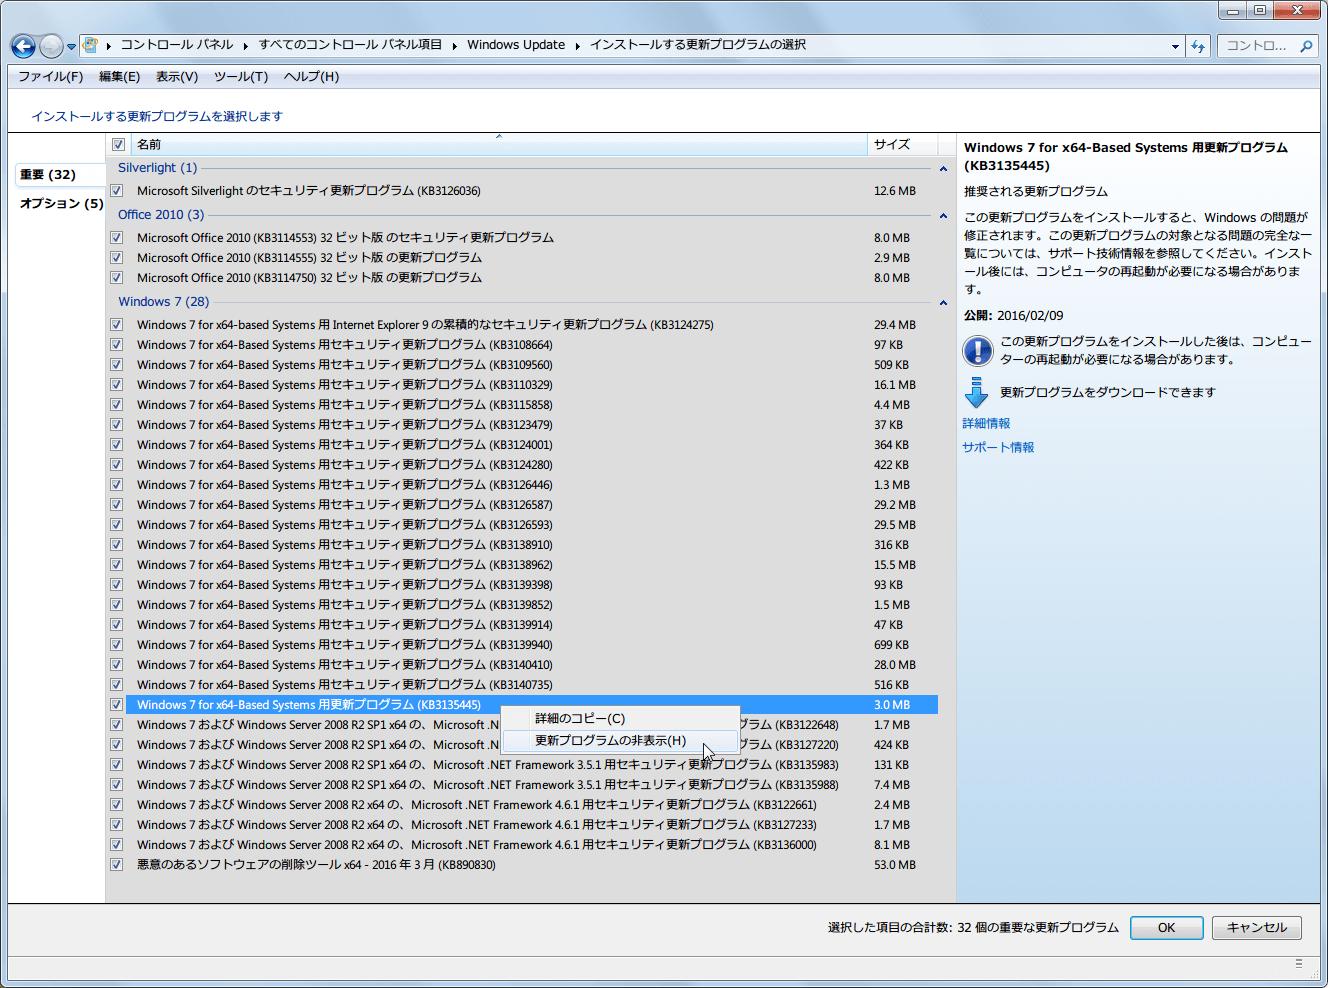 Windows 7 64bit Windows Update 重要 2016年2月9日公開 KB3135445 更新プログラムの非表示